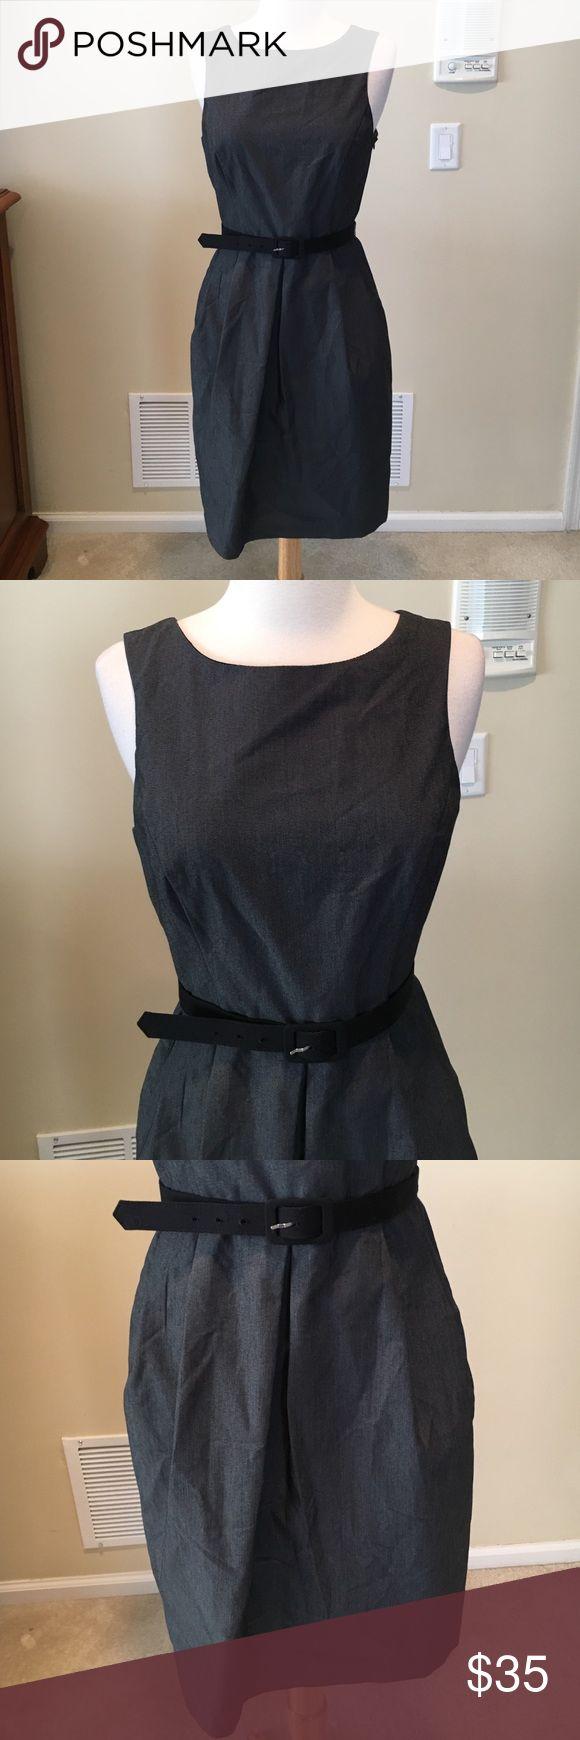 Eva Franco belted dress 🔴Excellent condition. 95% cotton 3% spandex and 2% polyester Eva Franco Dresses Midi